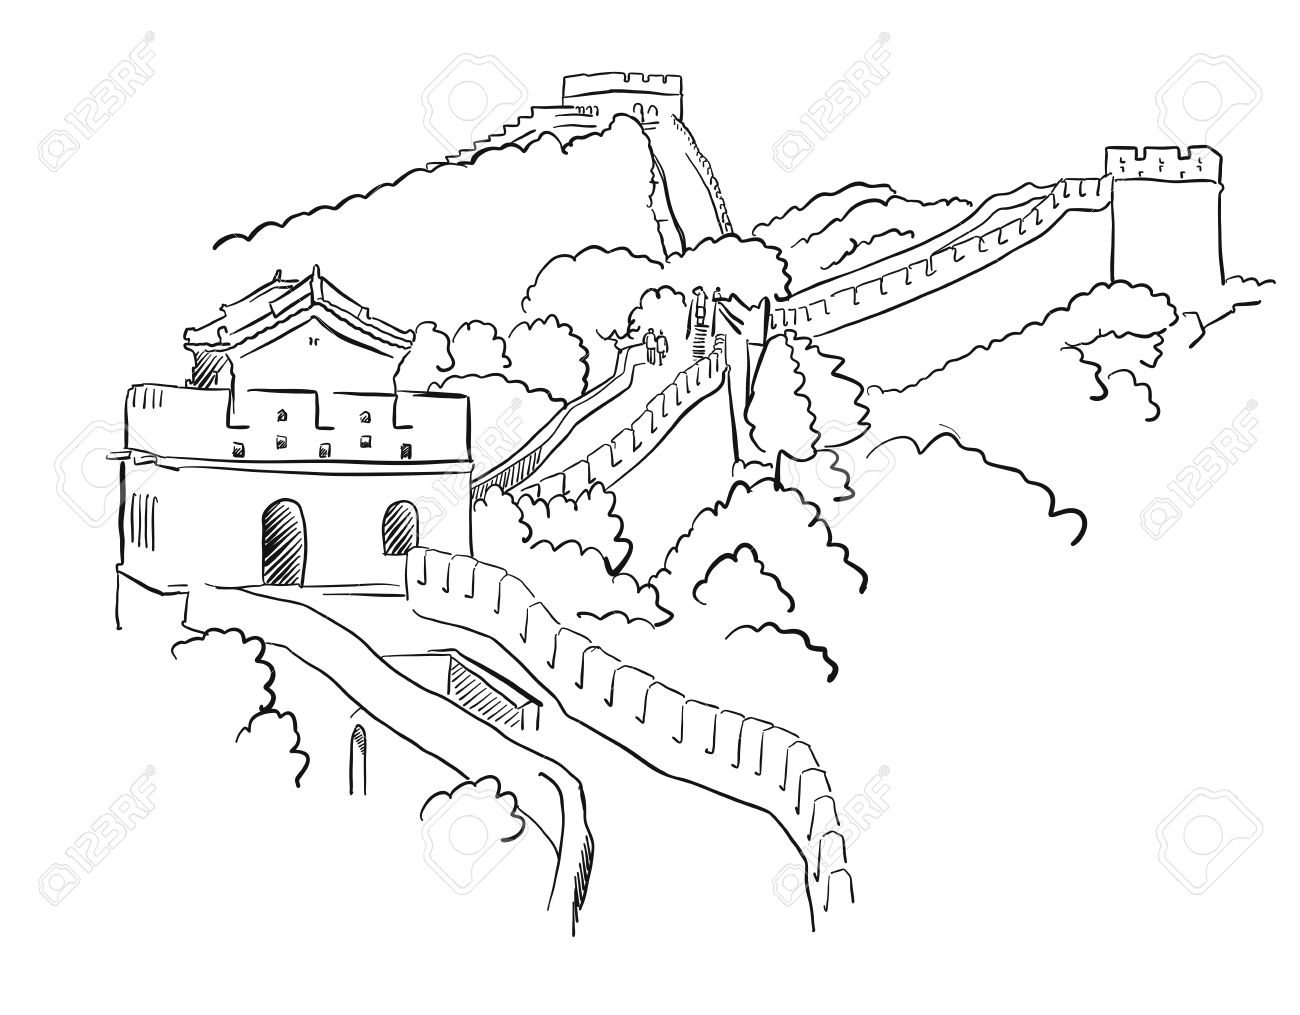 1300x1015 China Great Wall Vector Sketch, Famous Destination Landmark